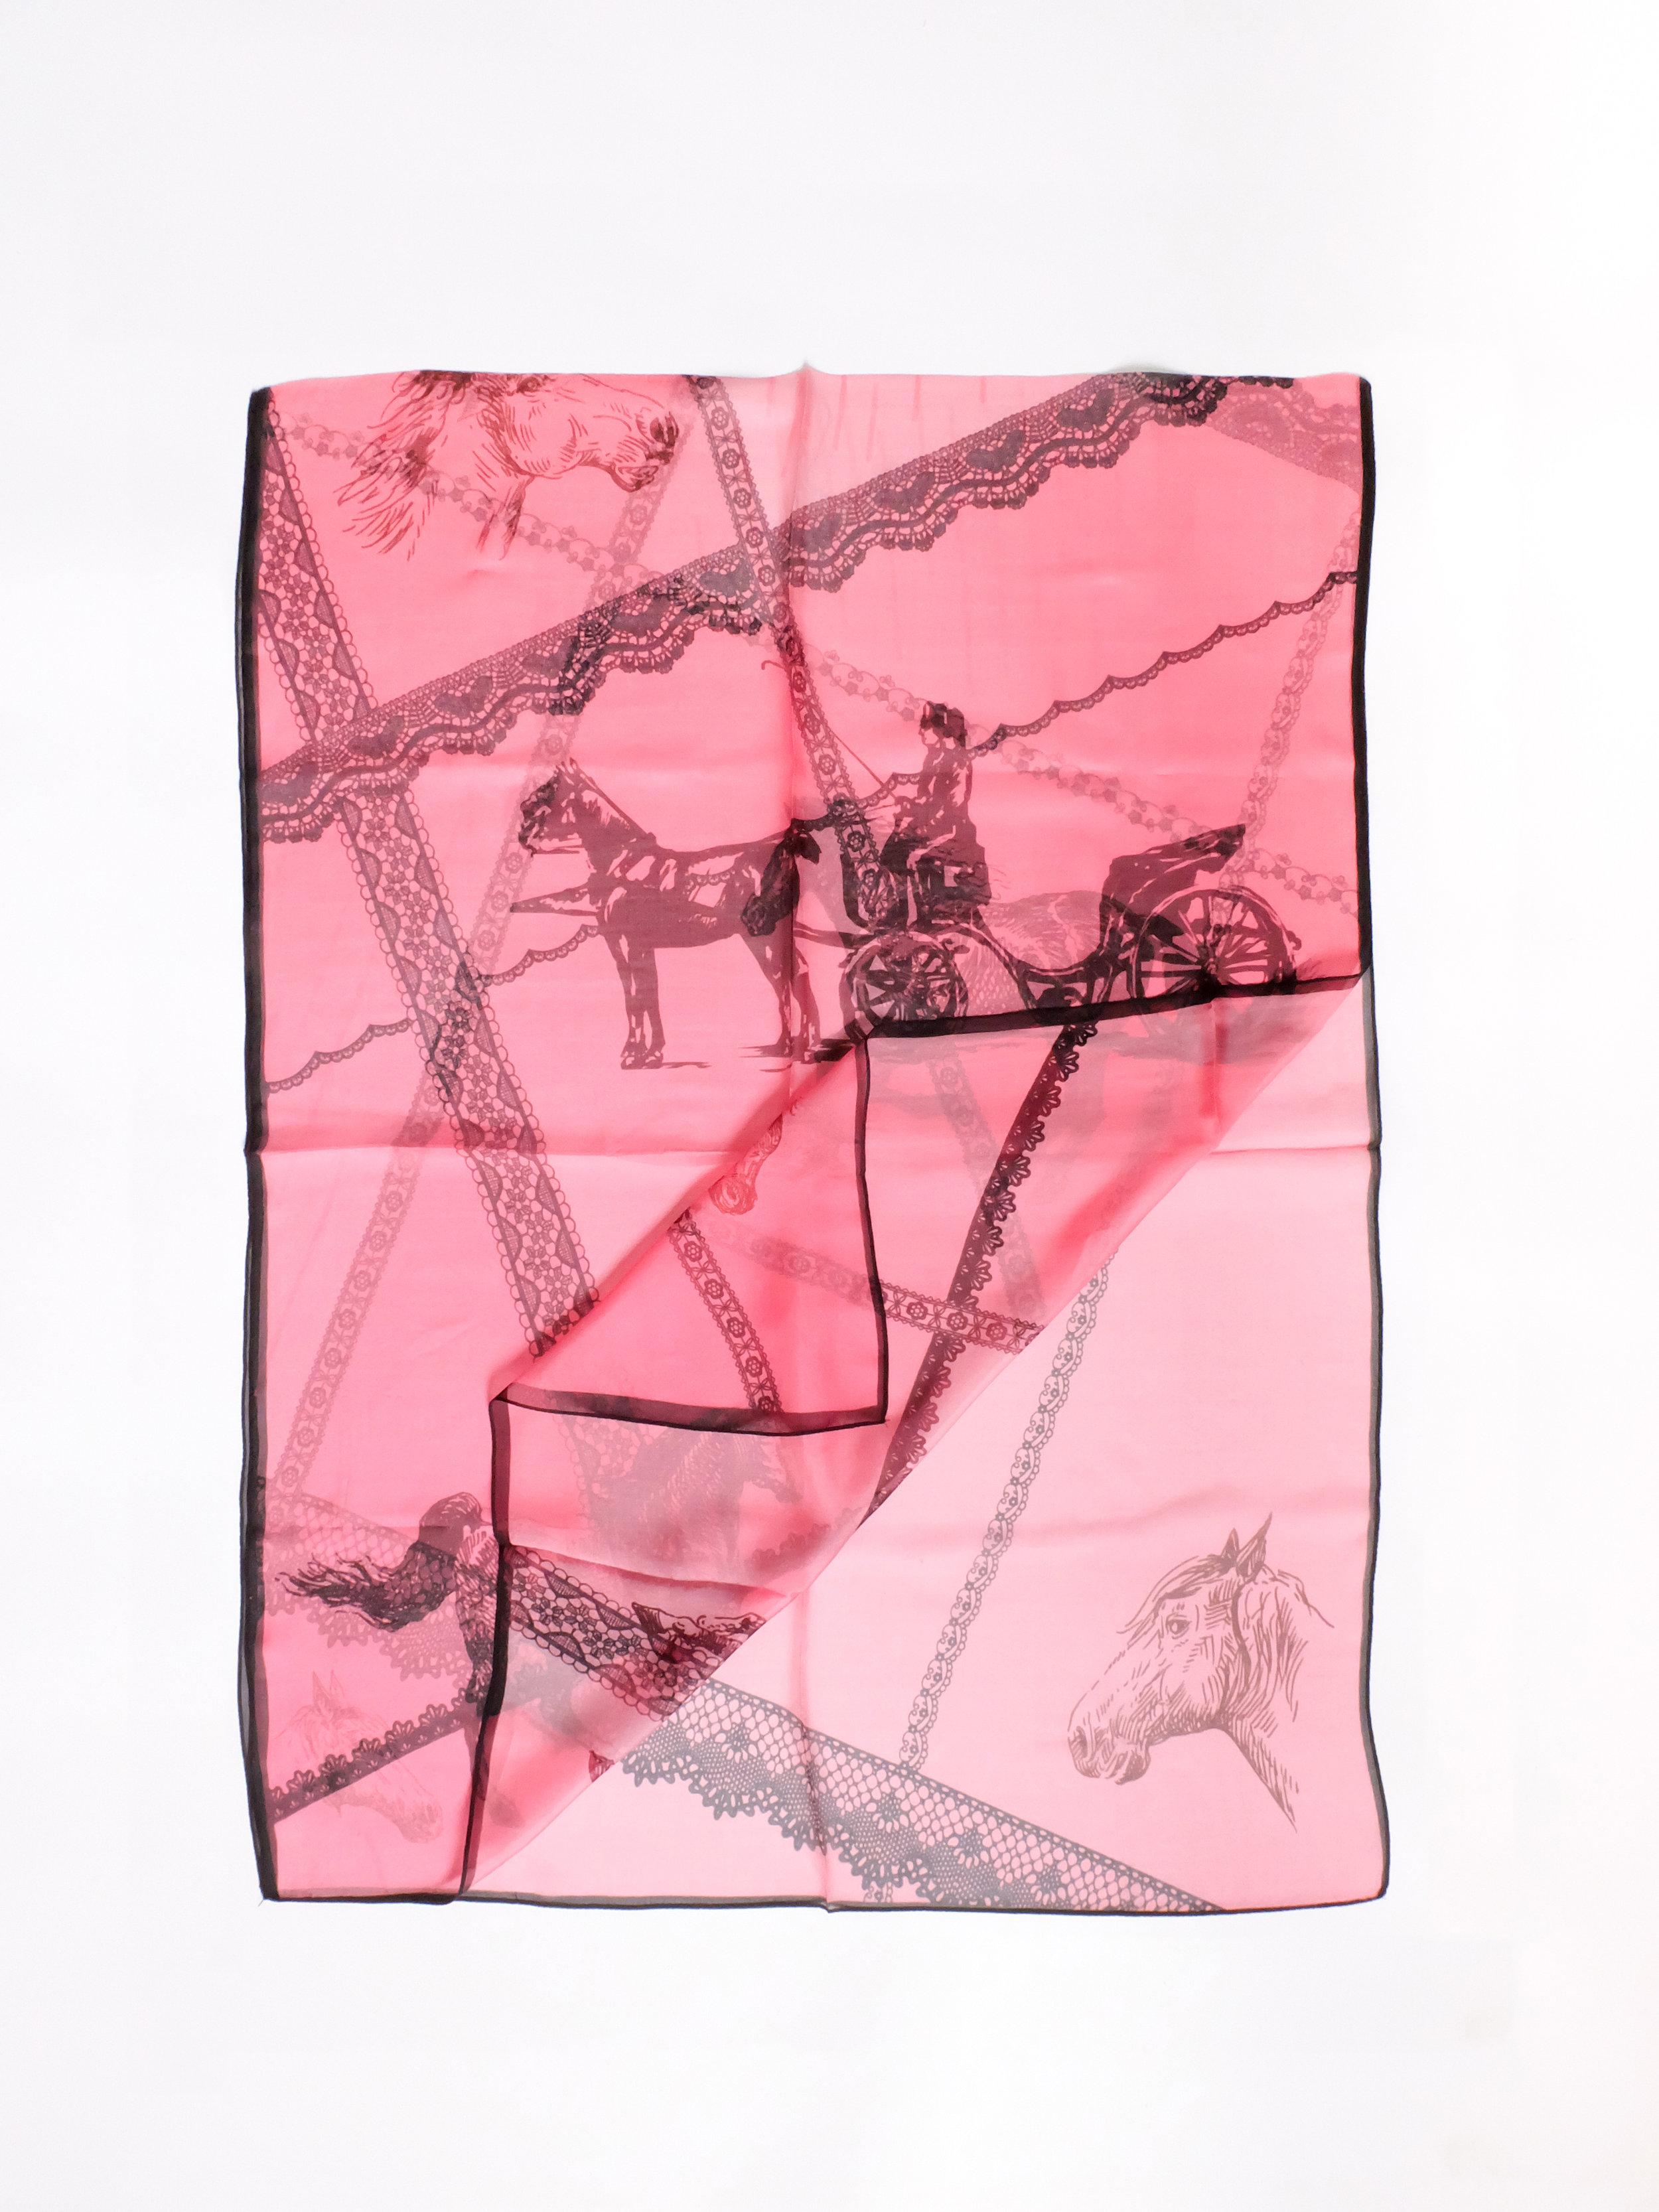 Equine Pomp (Pink) -  175x65cm